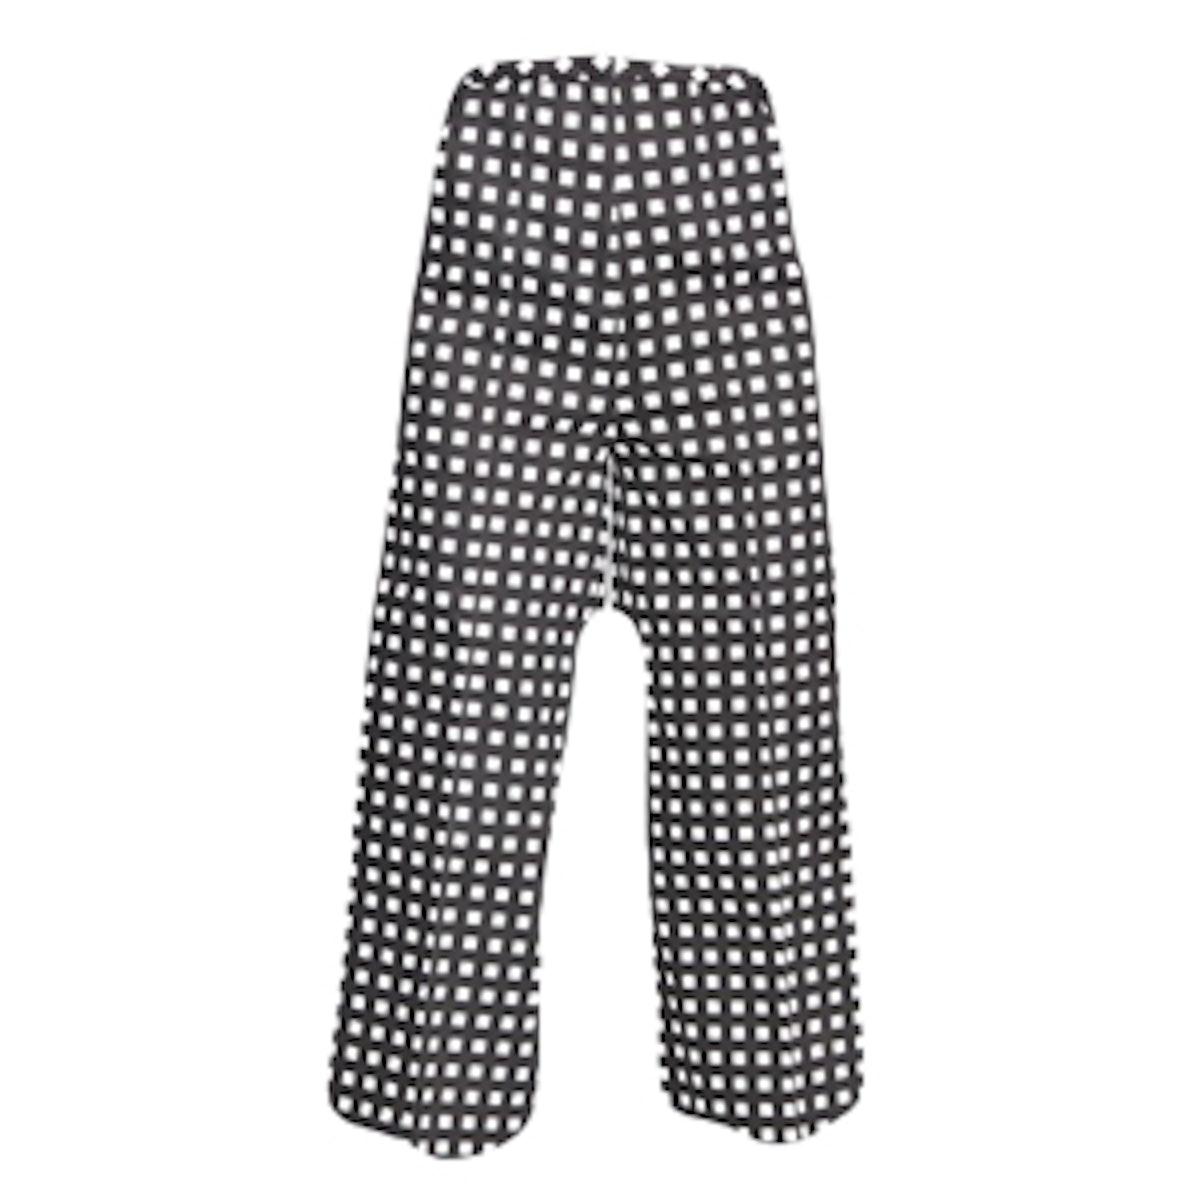 Gingham Printed Cotton Pants